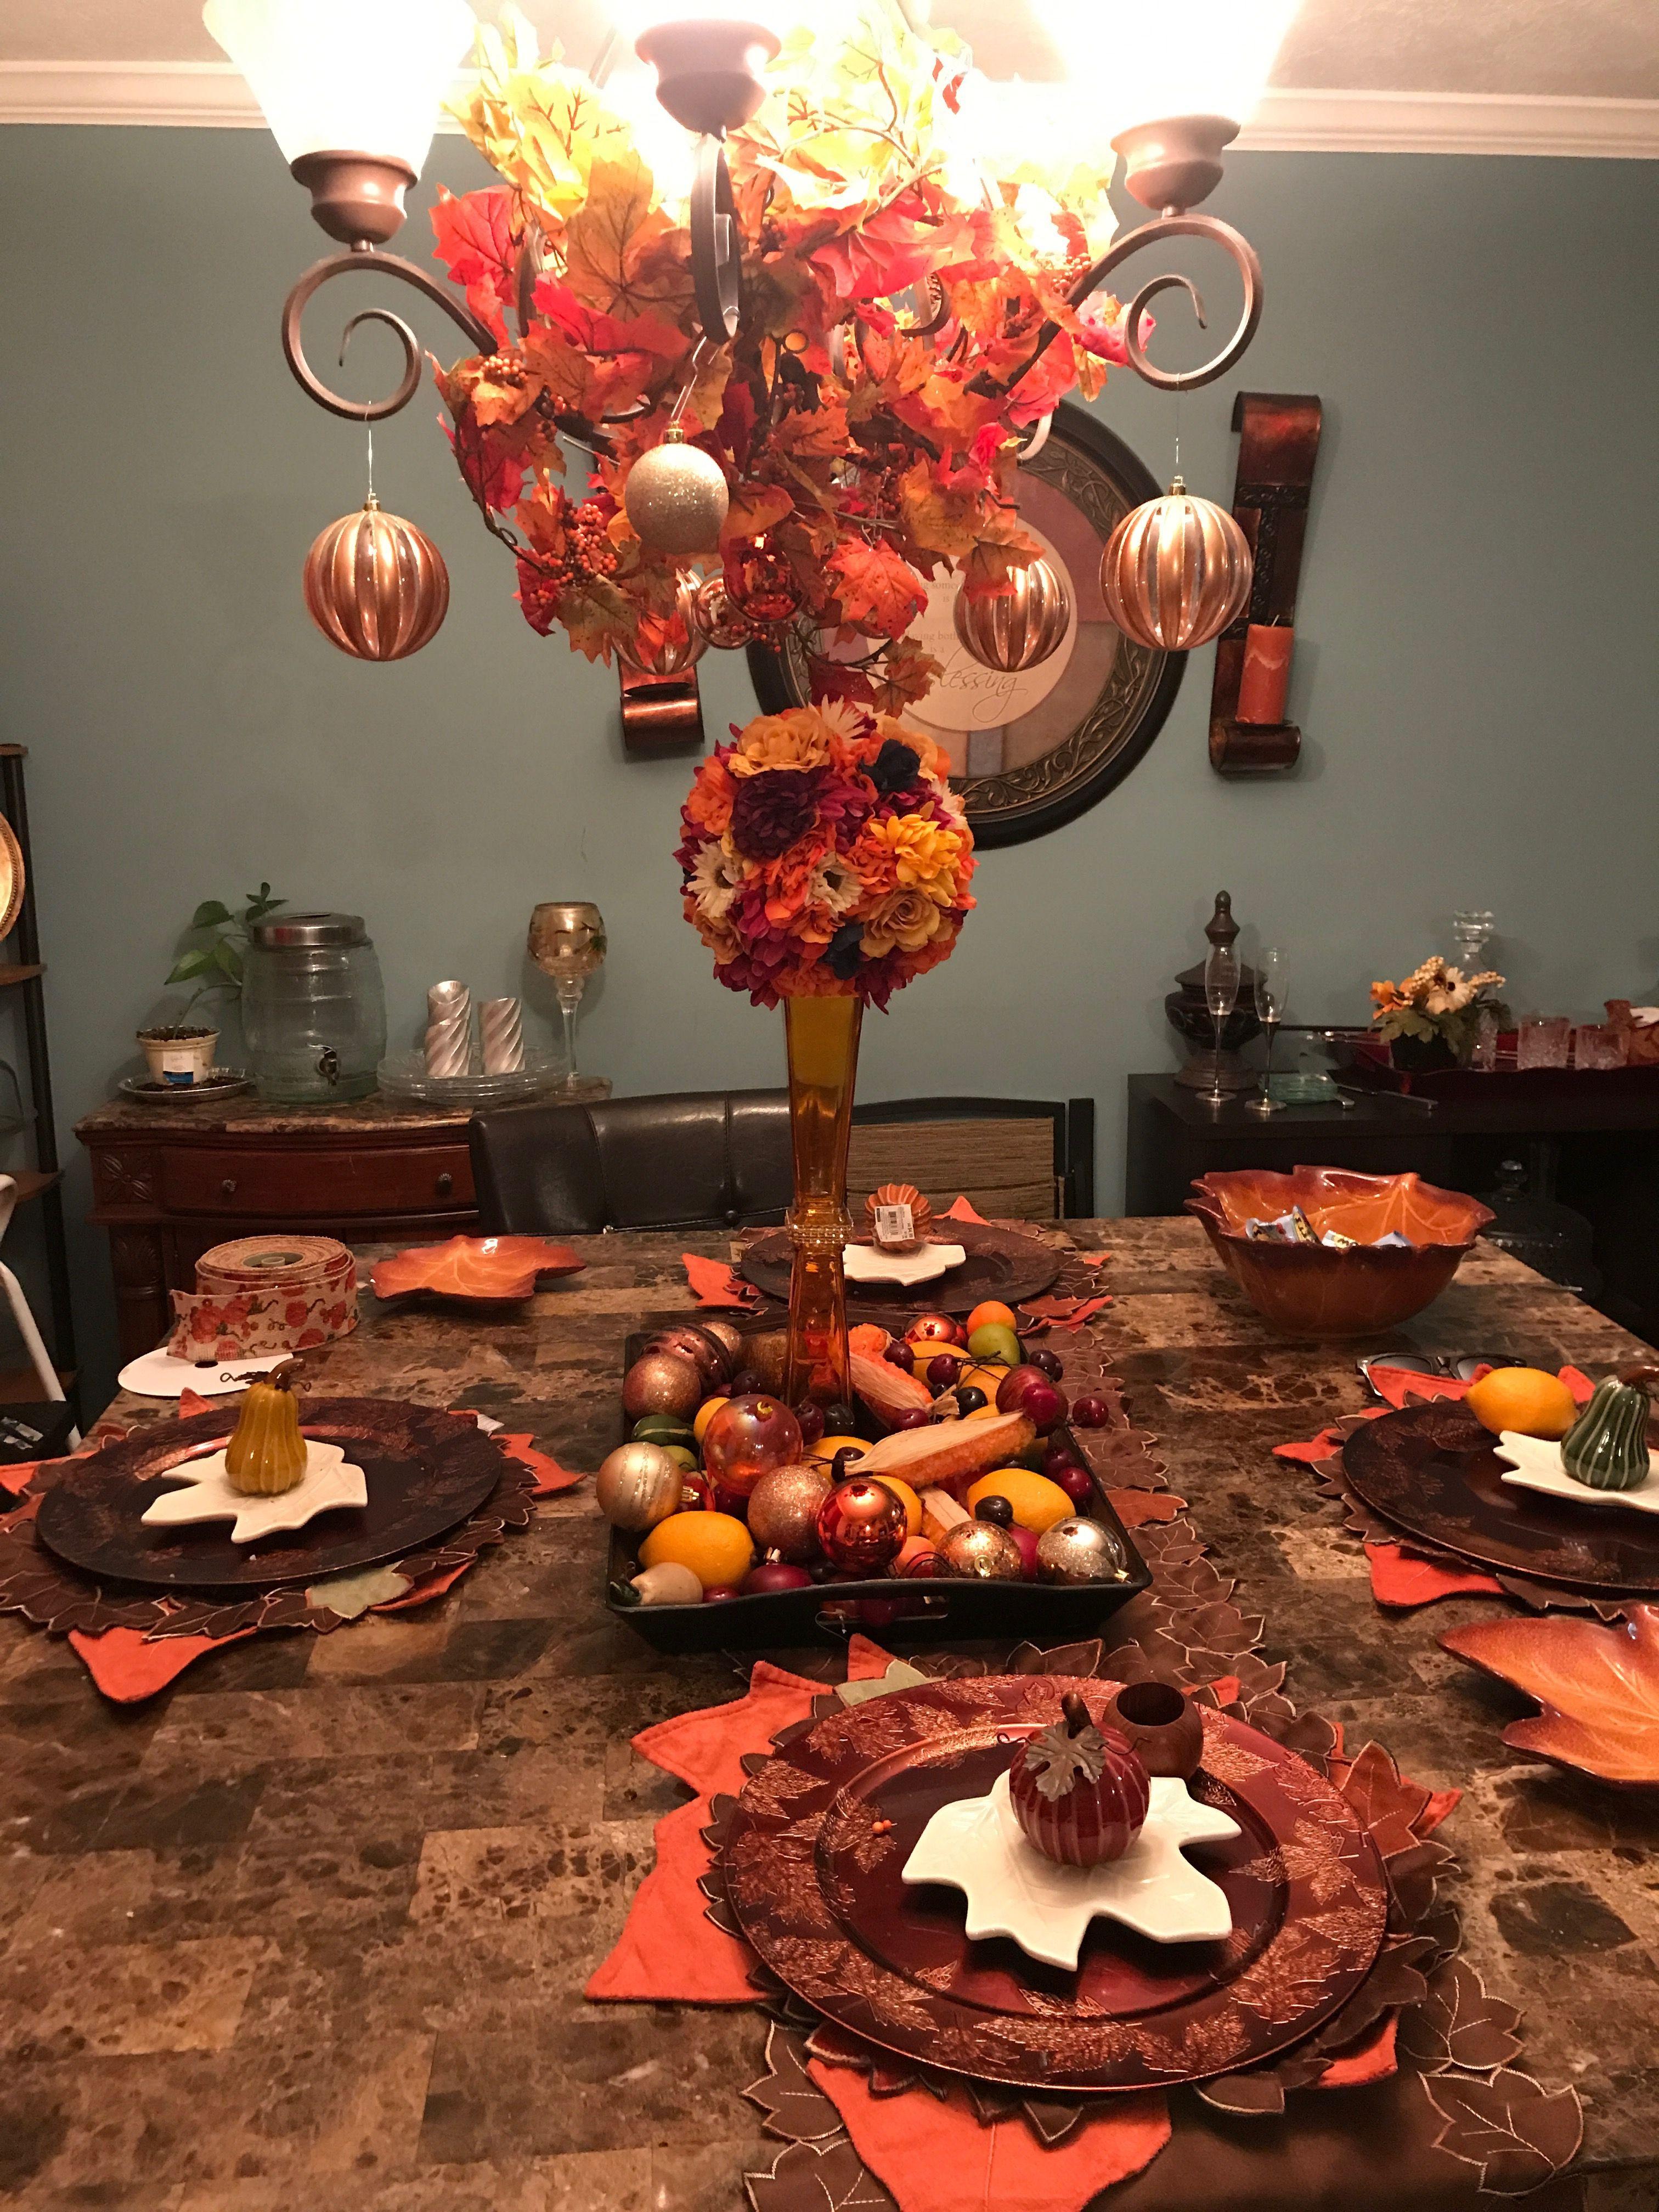 Pin By Tabbitha Martin On Fall Harvest Decor Thanksgiving Table Decorations Thanksgiving Decorations Fall Decor